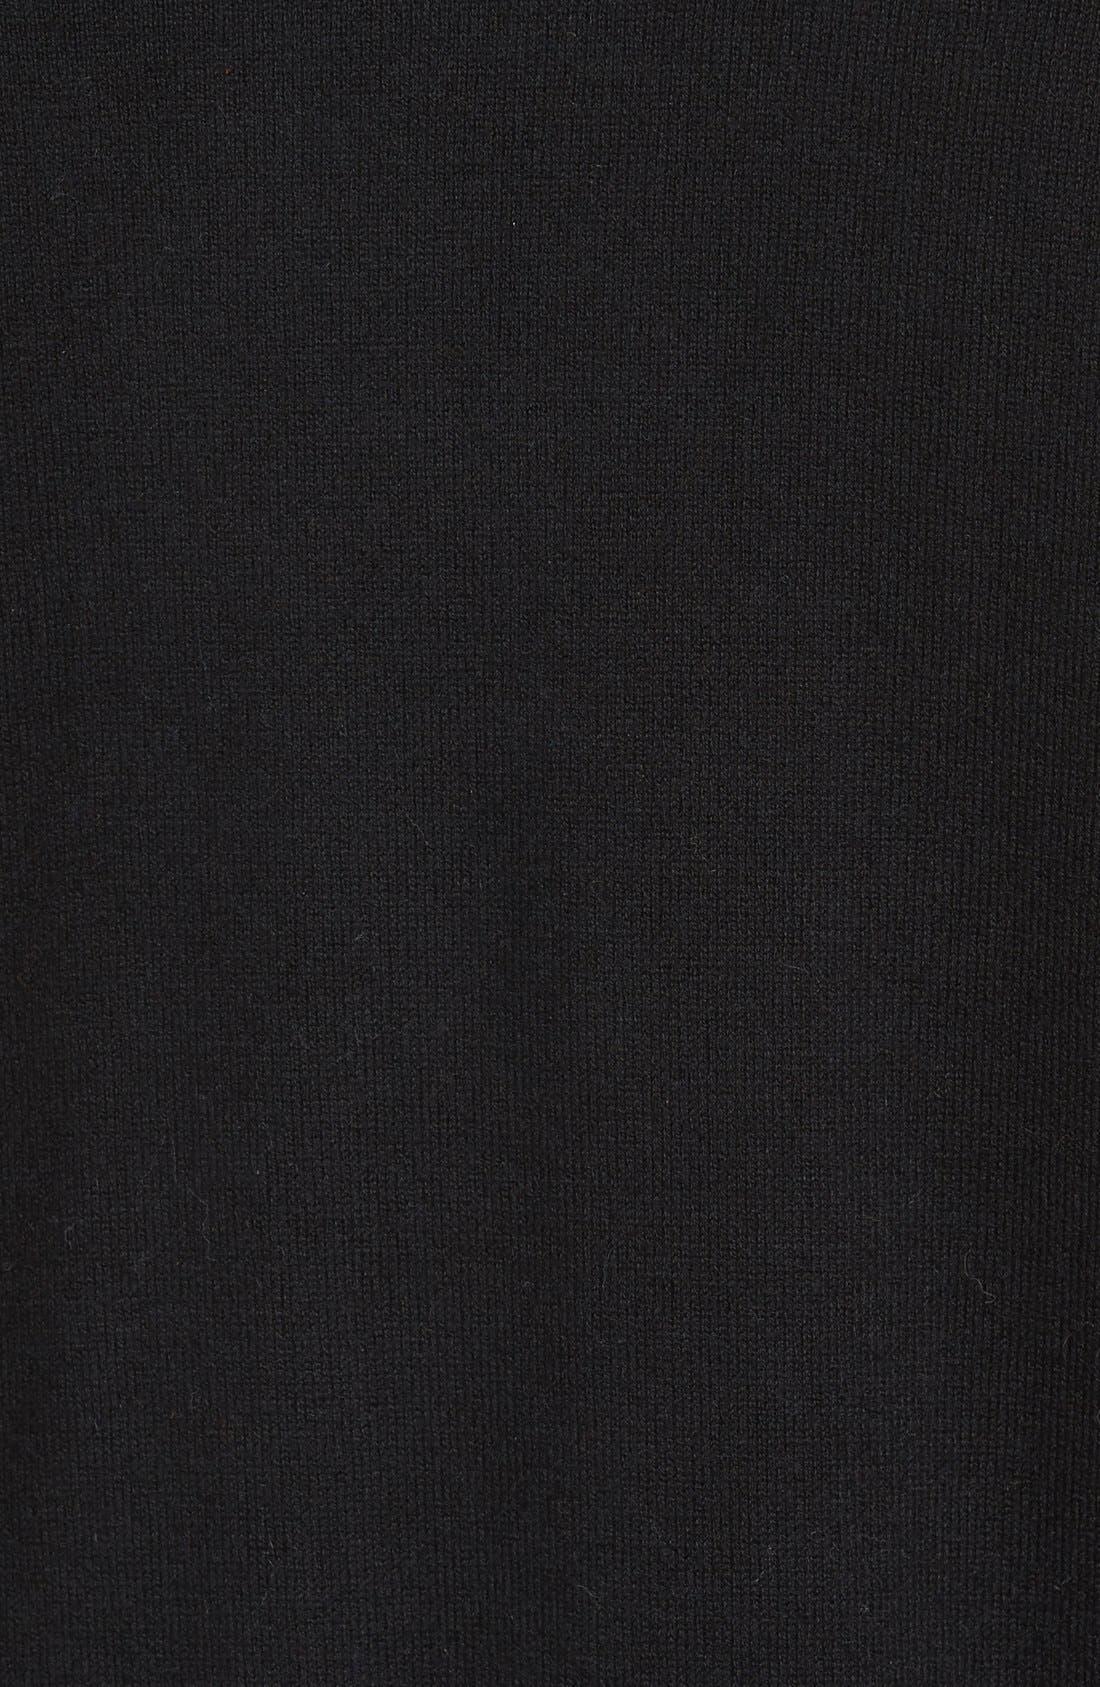 Alternate Image 5  - Robert Talbott 'Jersey Sport' Cotton Blend Crewneck Sweater